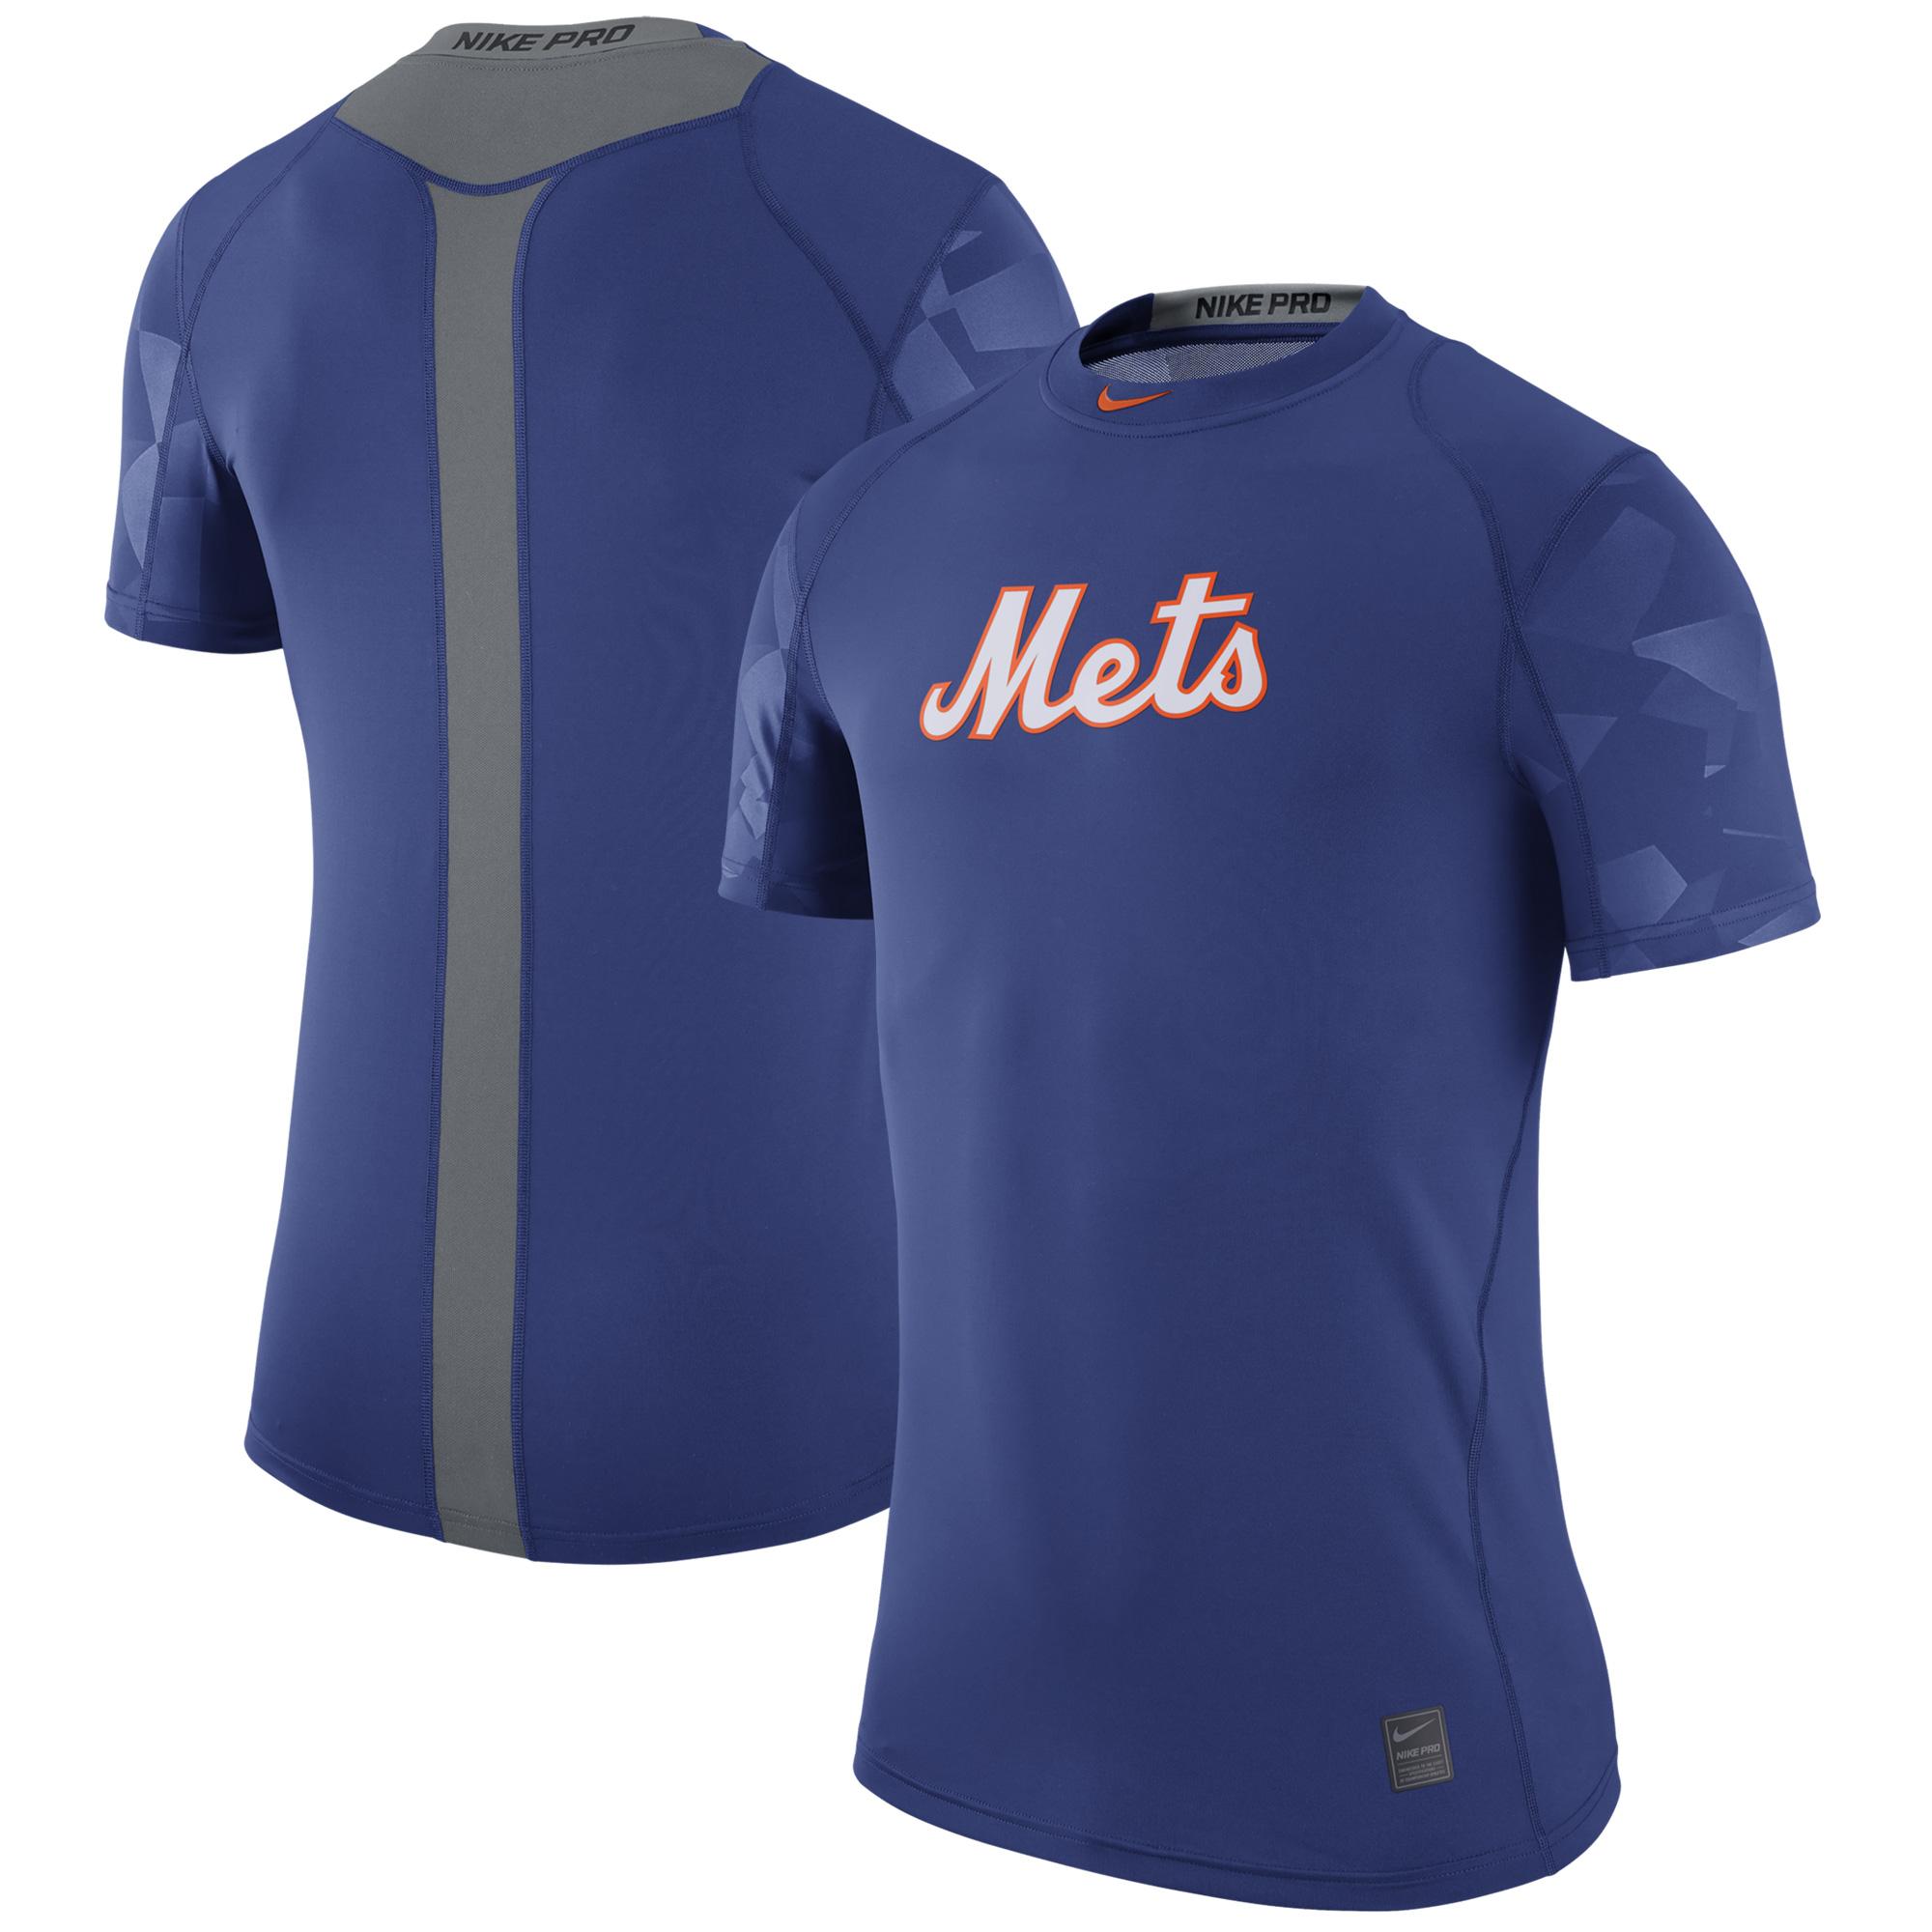 New York Mets Nike Pro Cool Performance T-Shirt - Royal